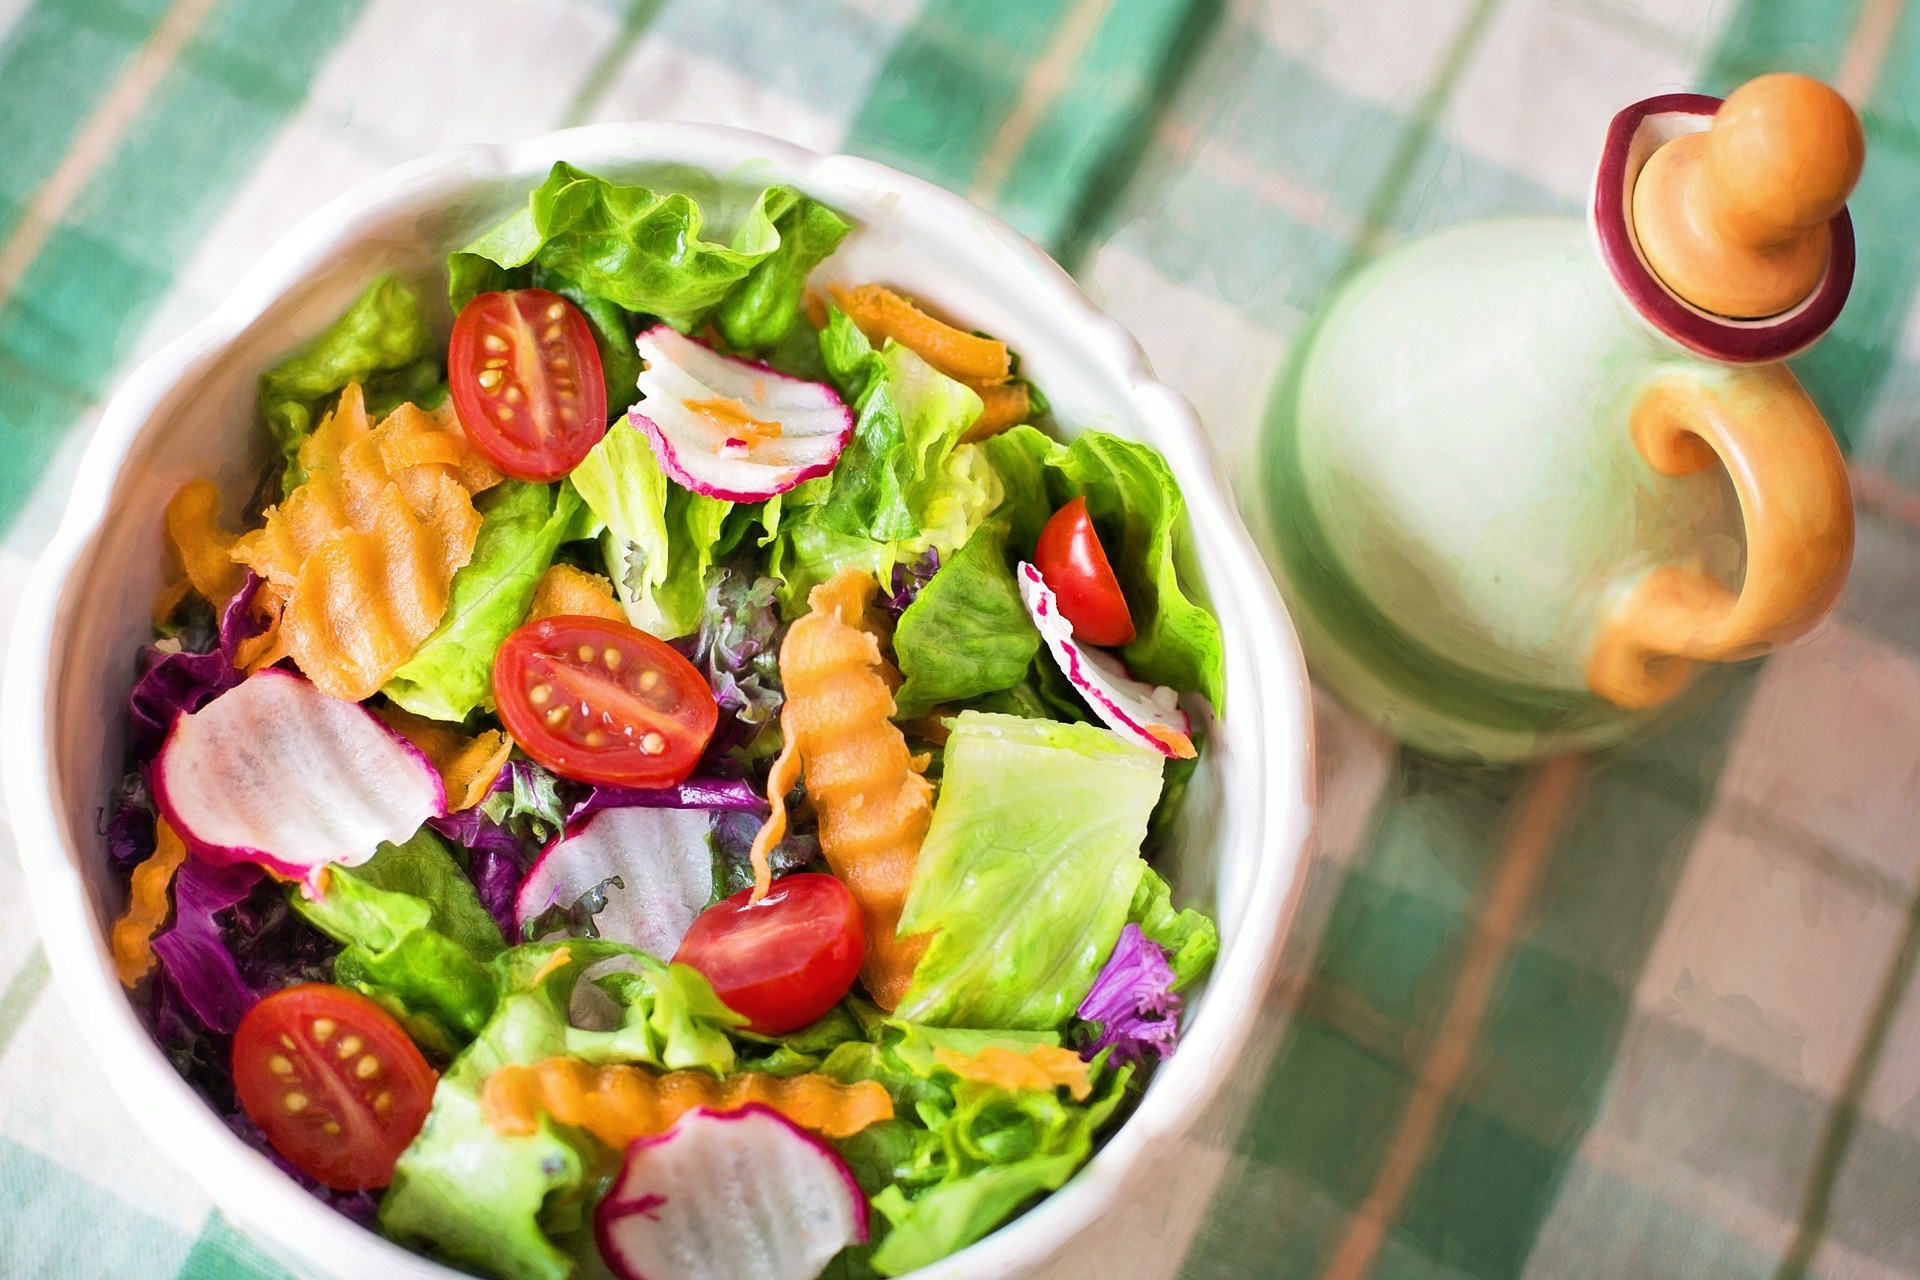 Dieta clean o clean eating: mangiare pulito funziona e fa dimagrire?